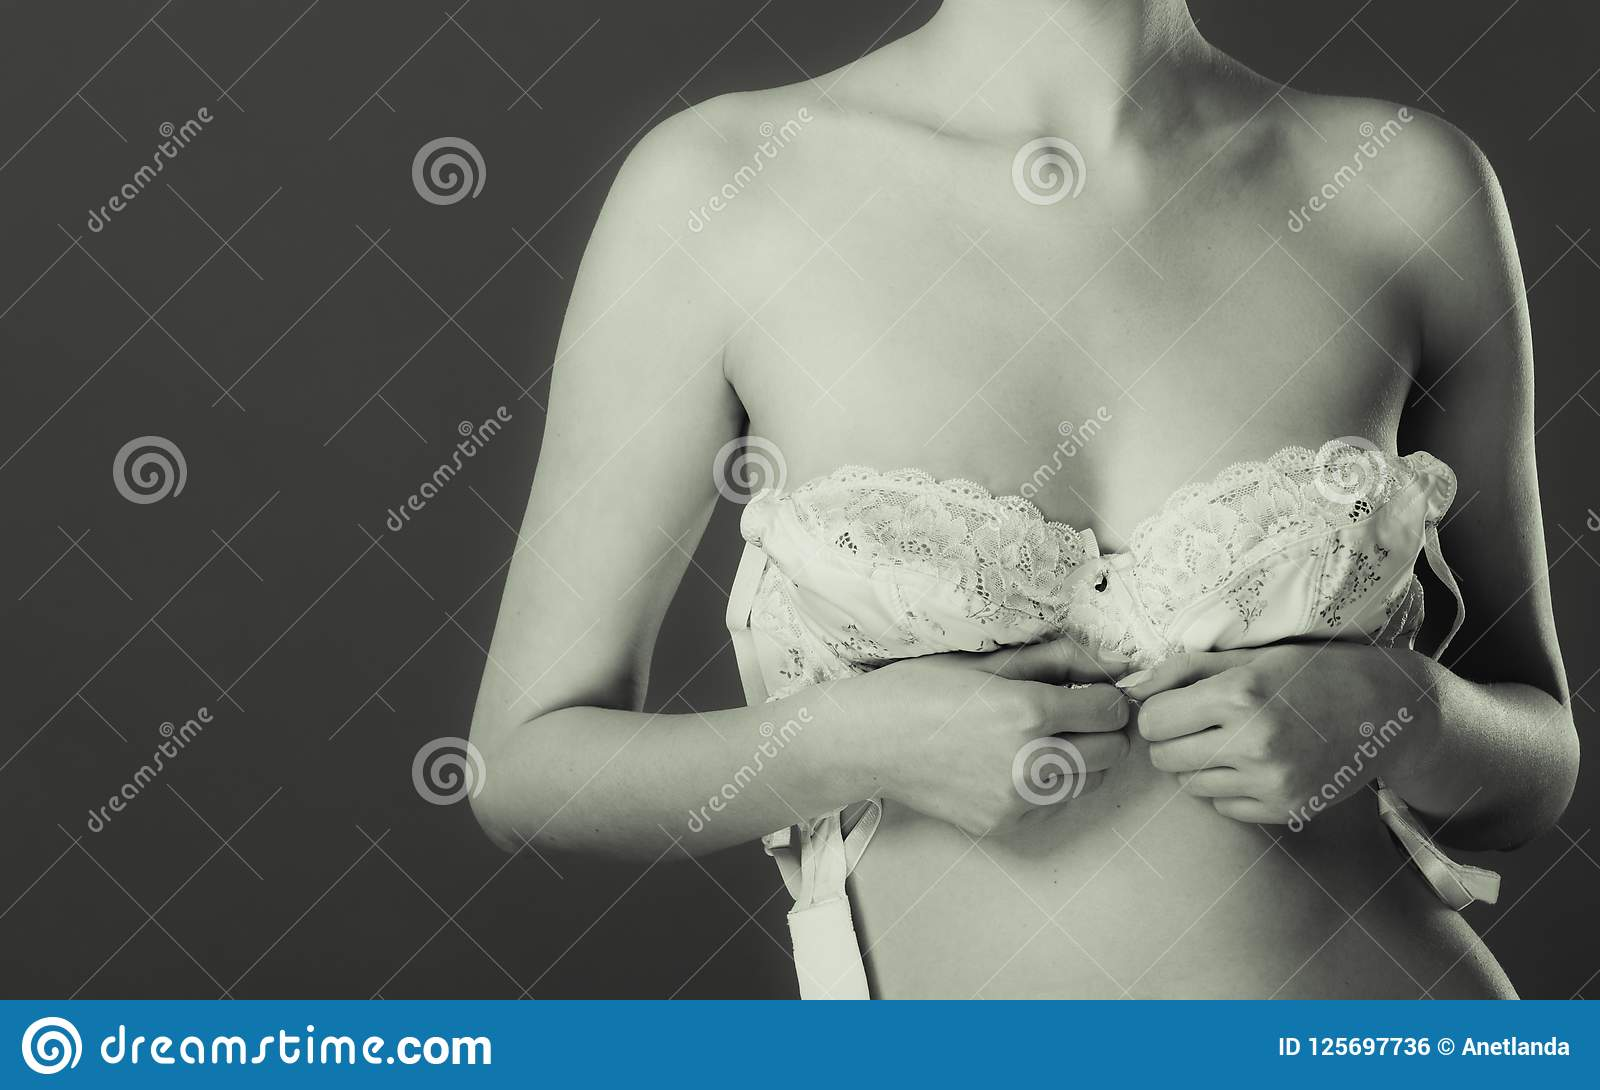 Emily browning boob